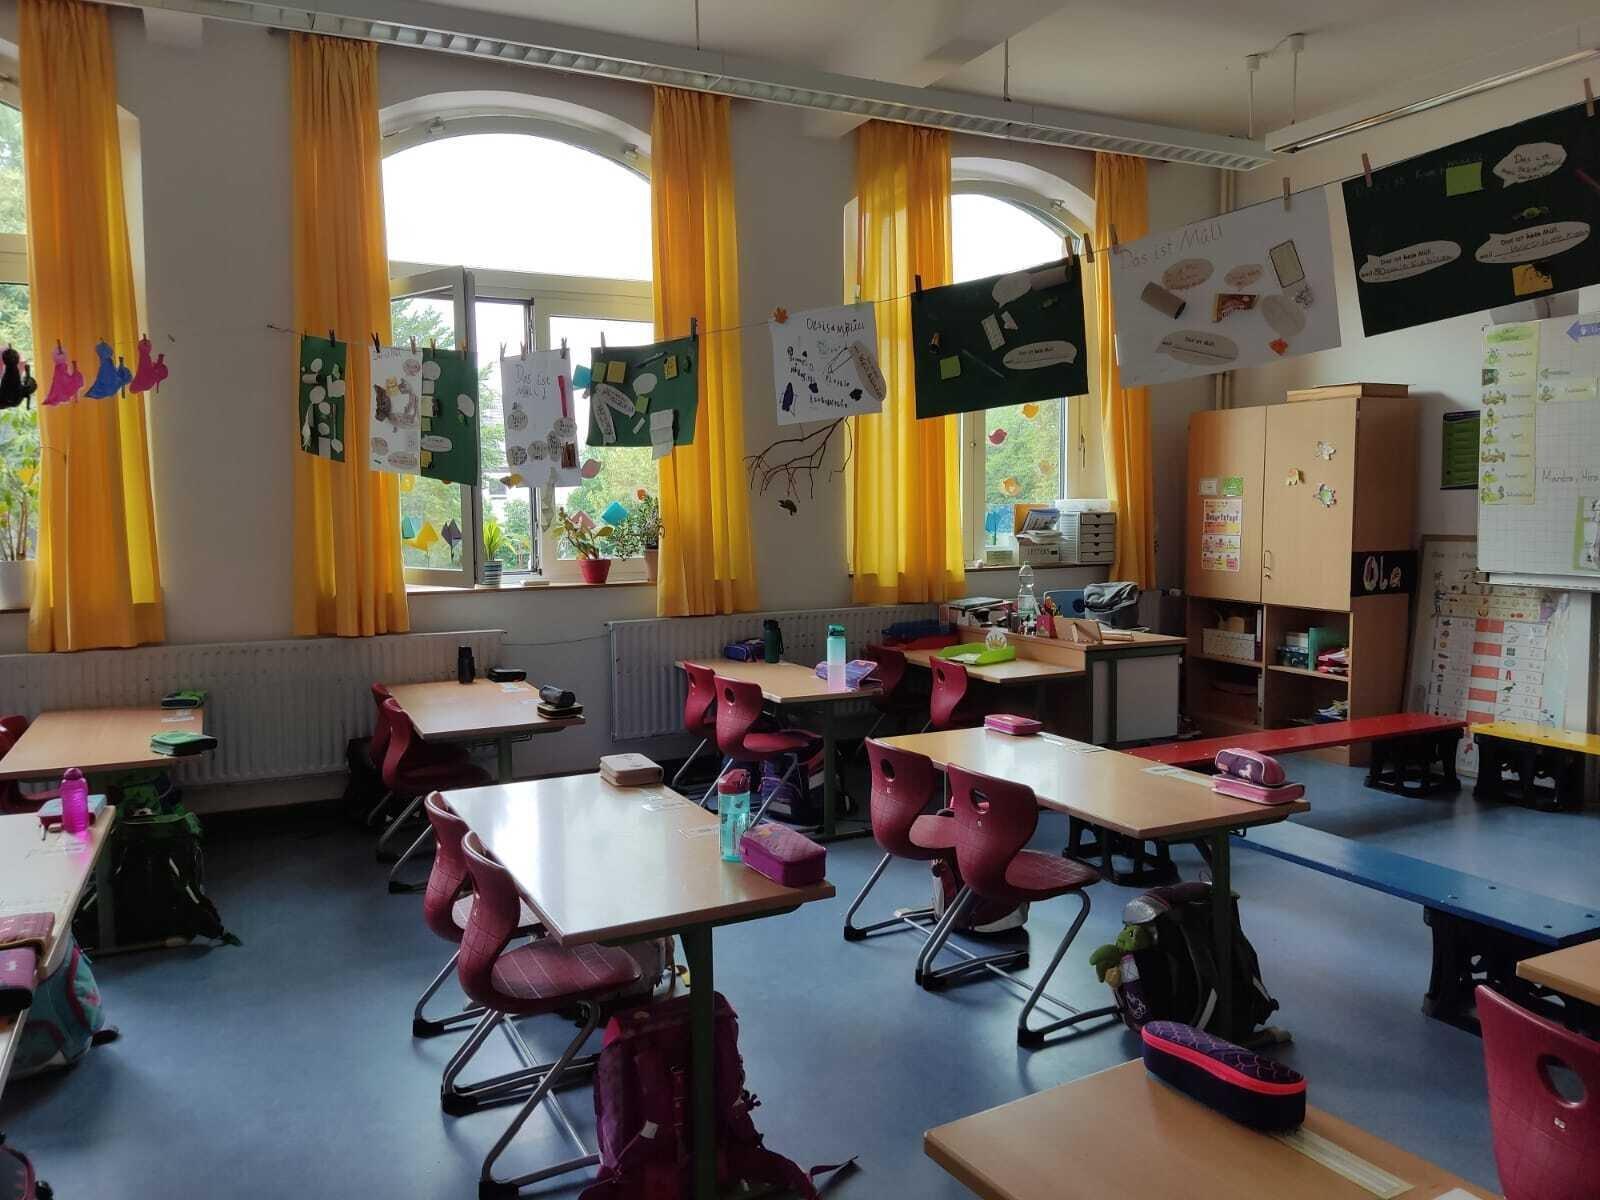 Blick in eine erste Klasse